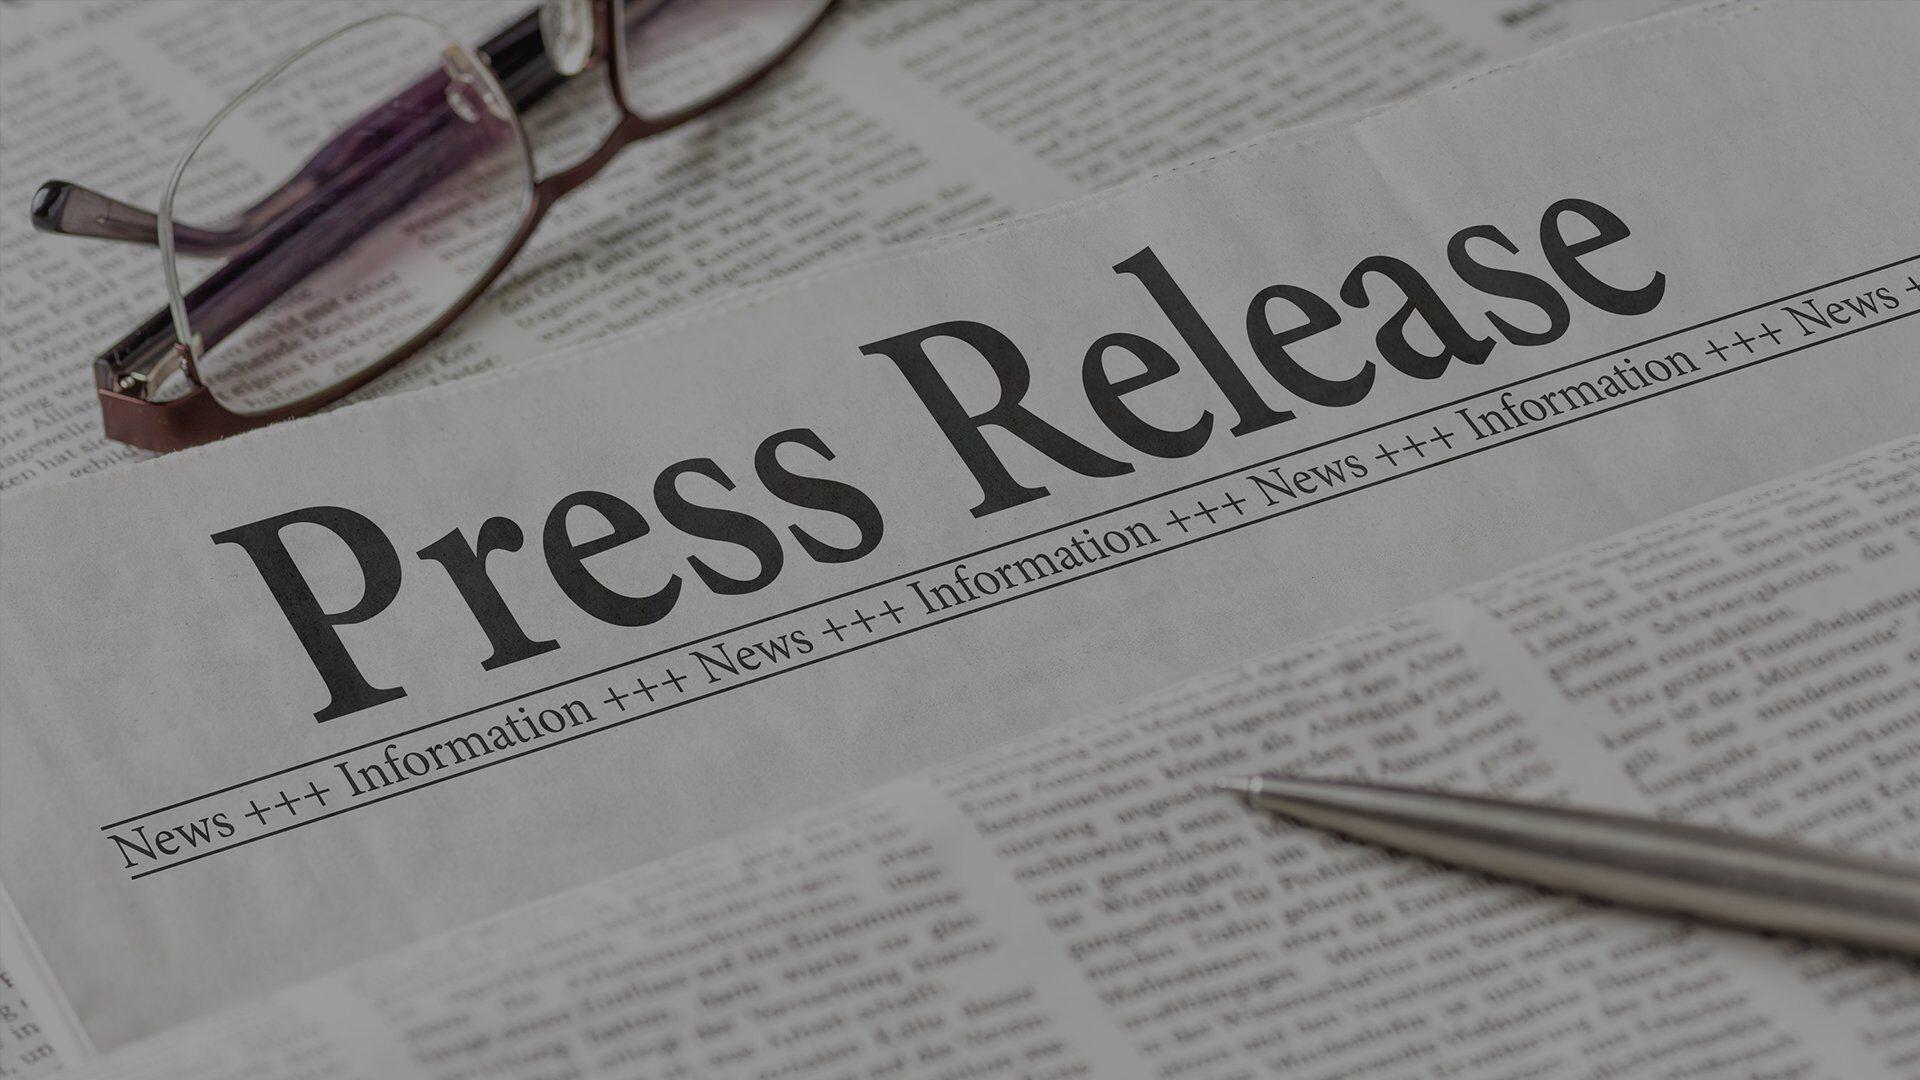 Press Release - Digital Marketing